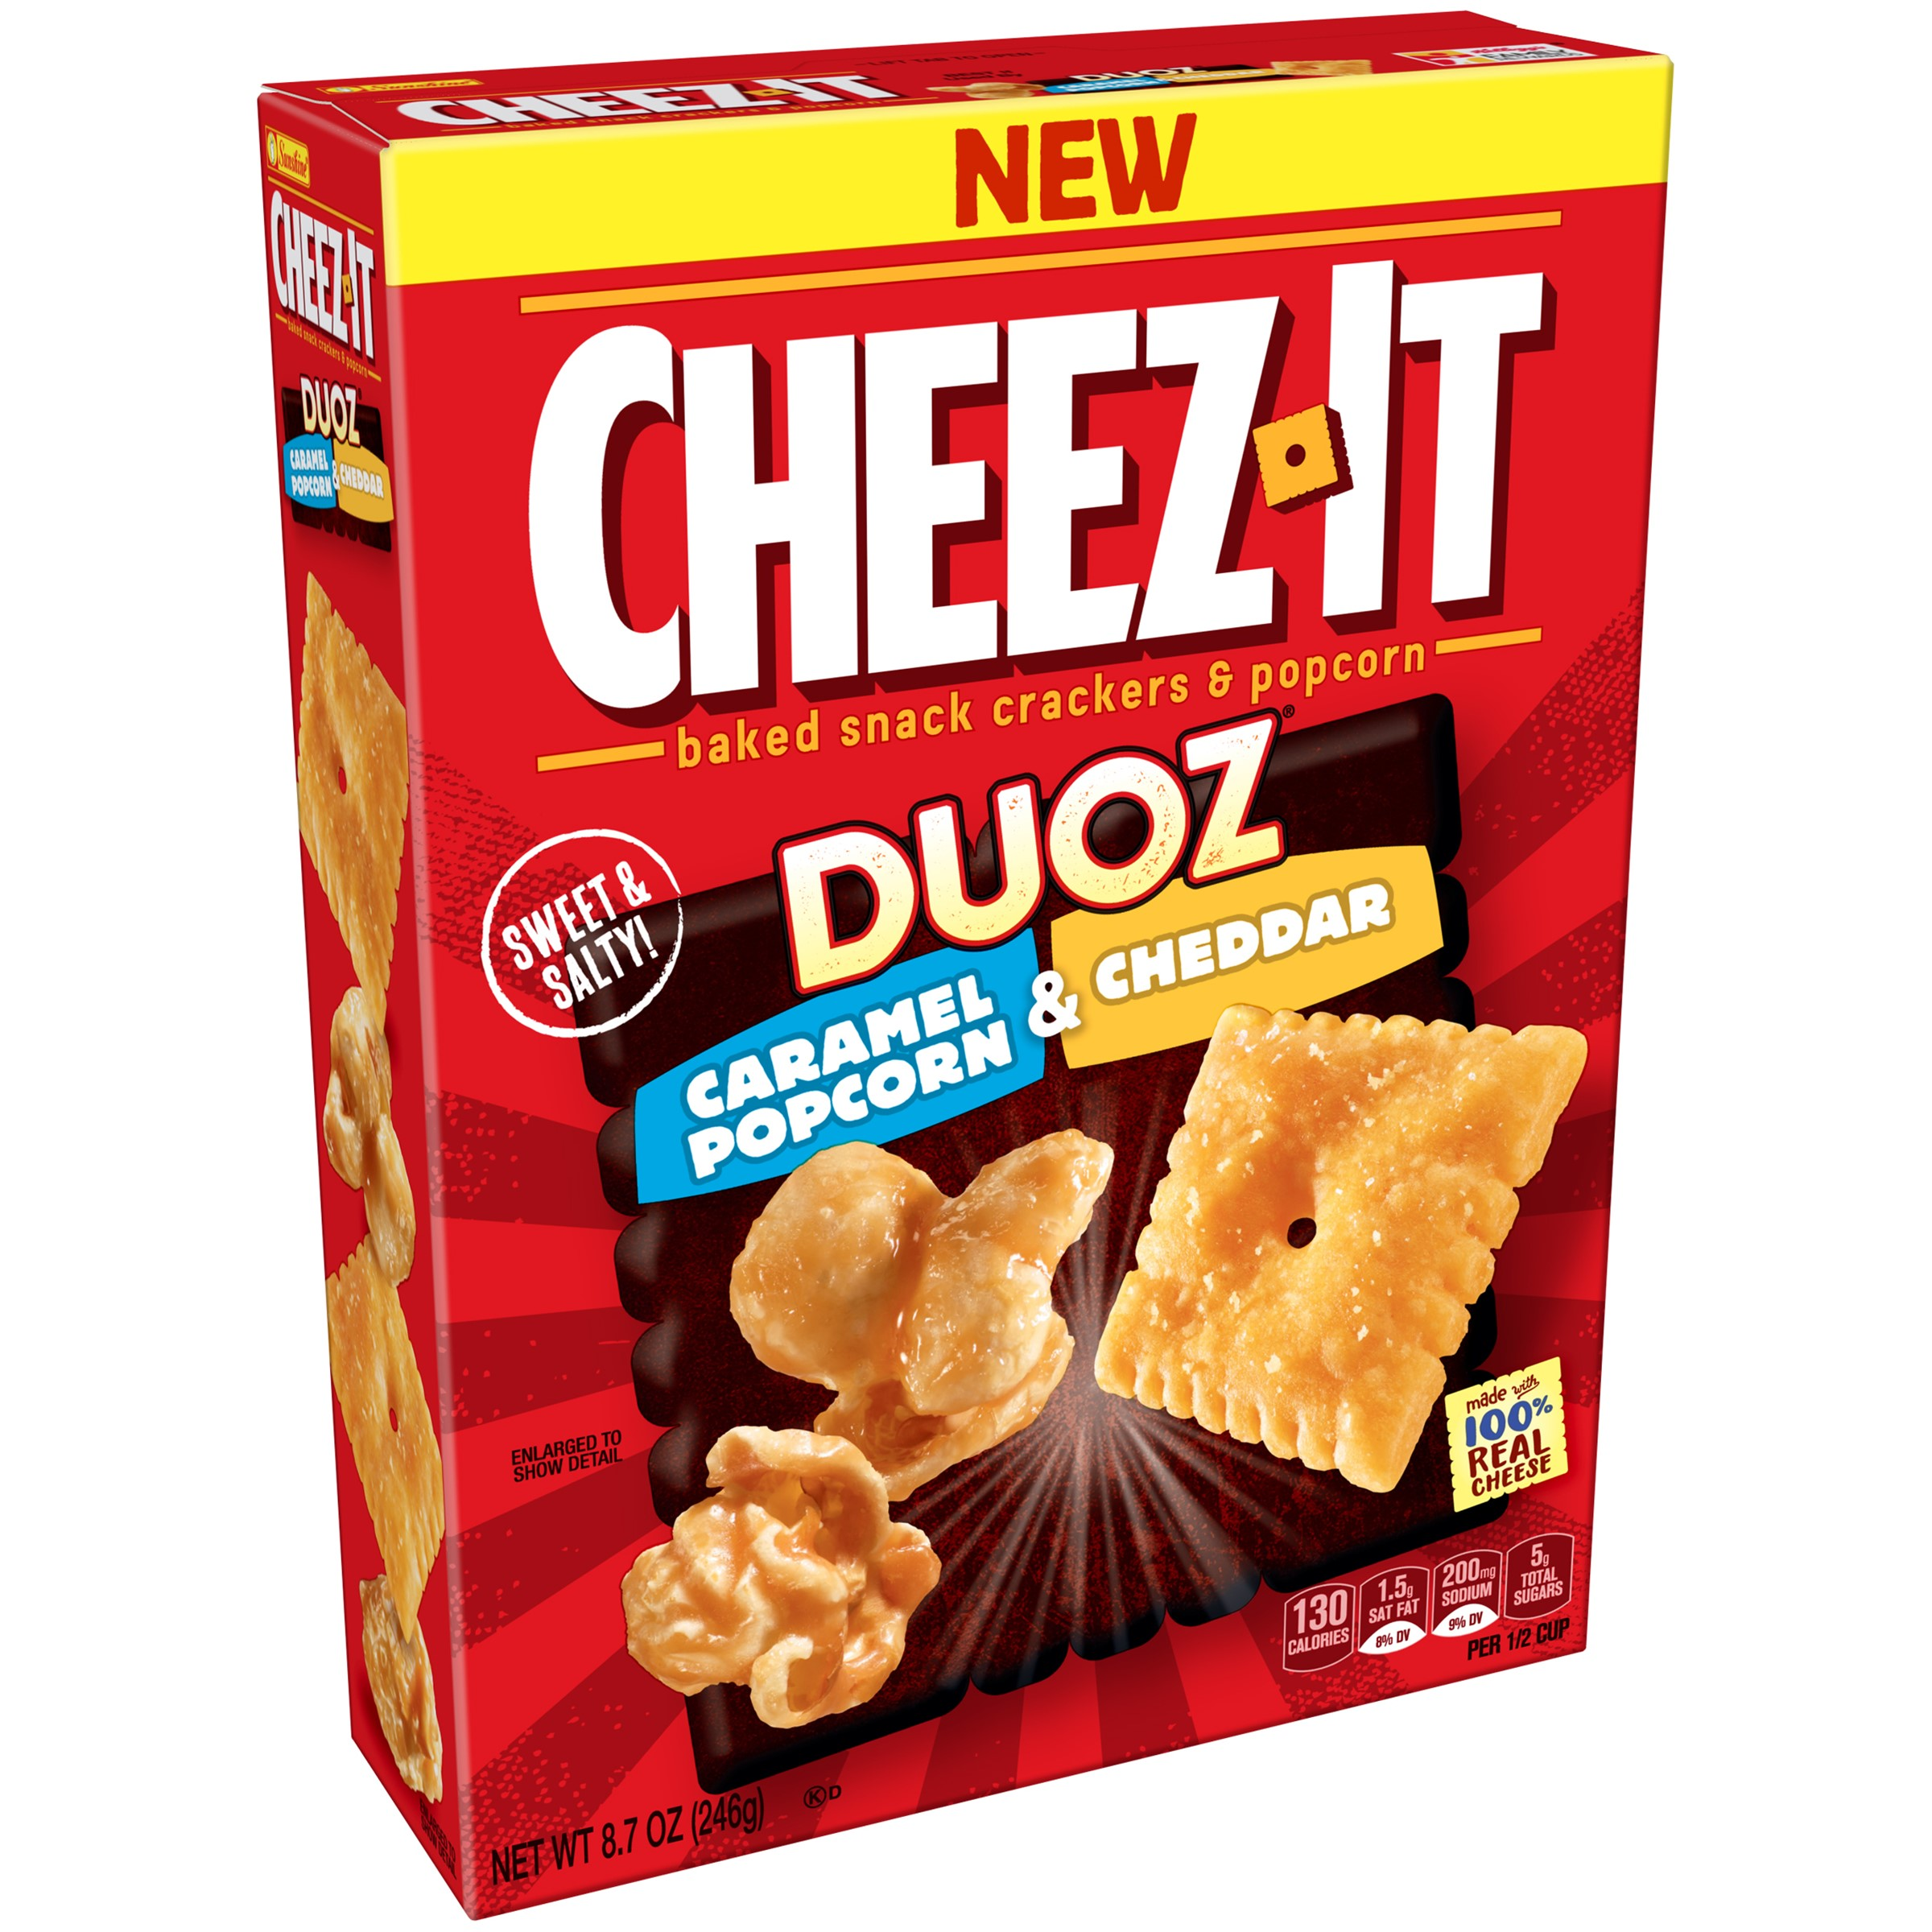 (2 Pack) Cheez-It Duoz Caramel Popcorn & Cheddar Baked Snack Crackers & Popcorn 8.7 oz. Box